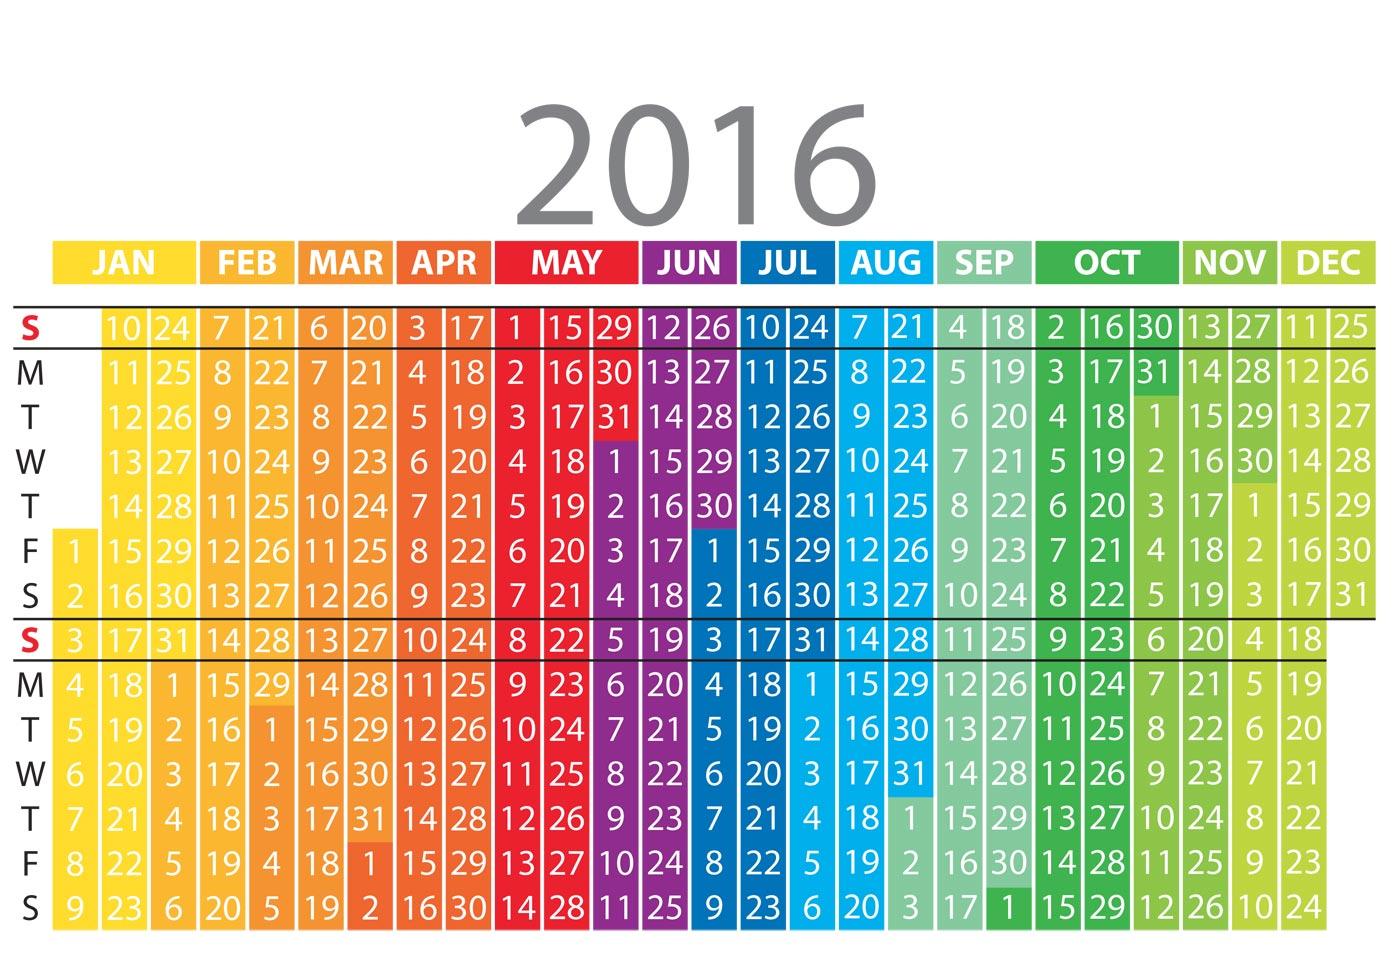 Calendar Free Vector : Colorful vertical calendar download free vector art